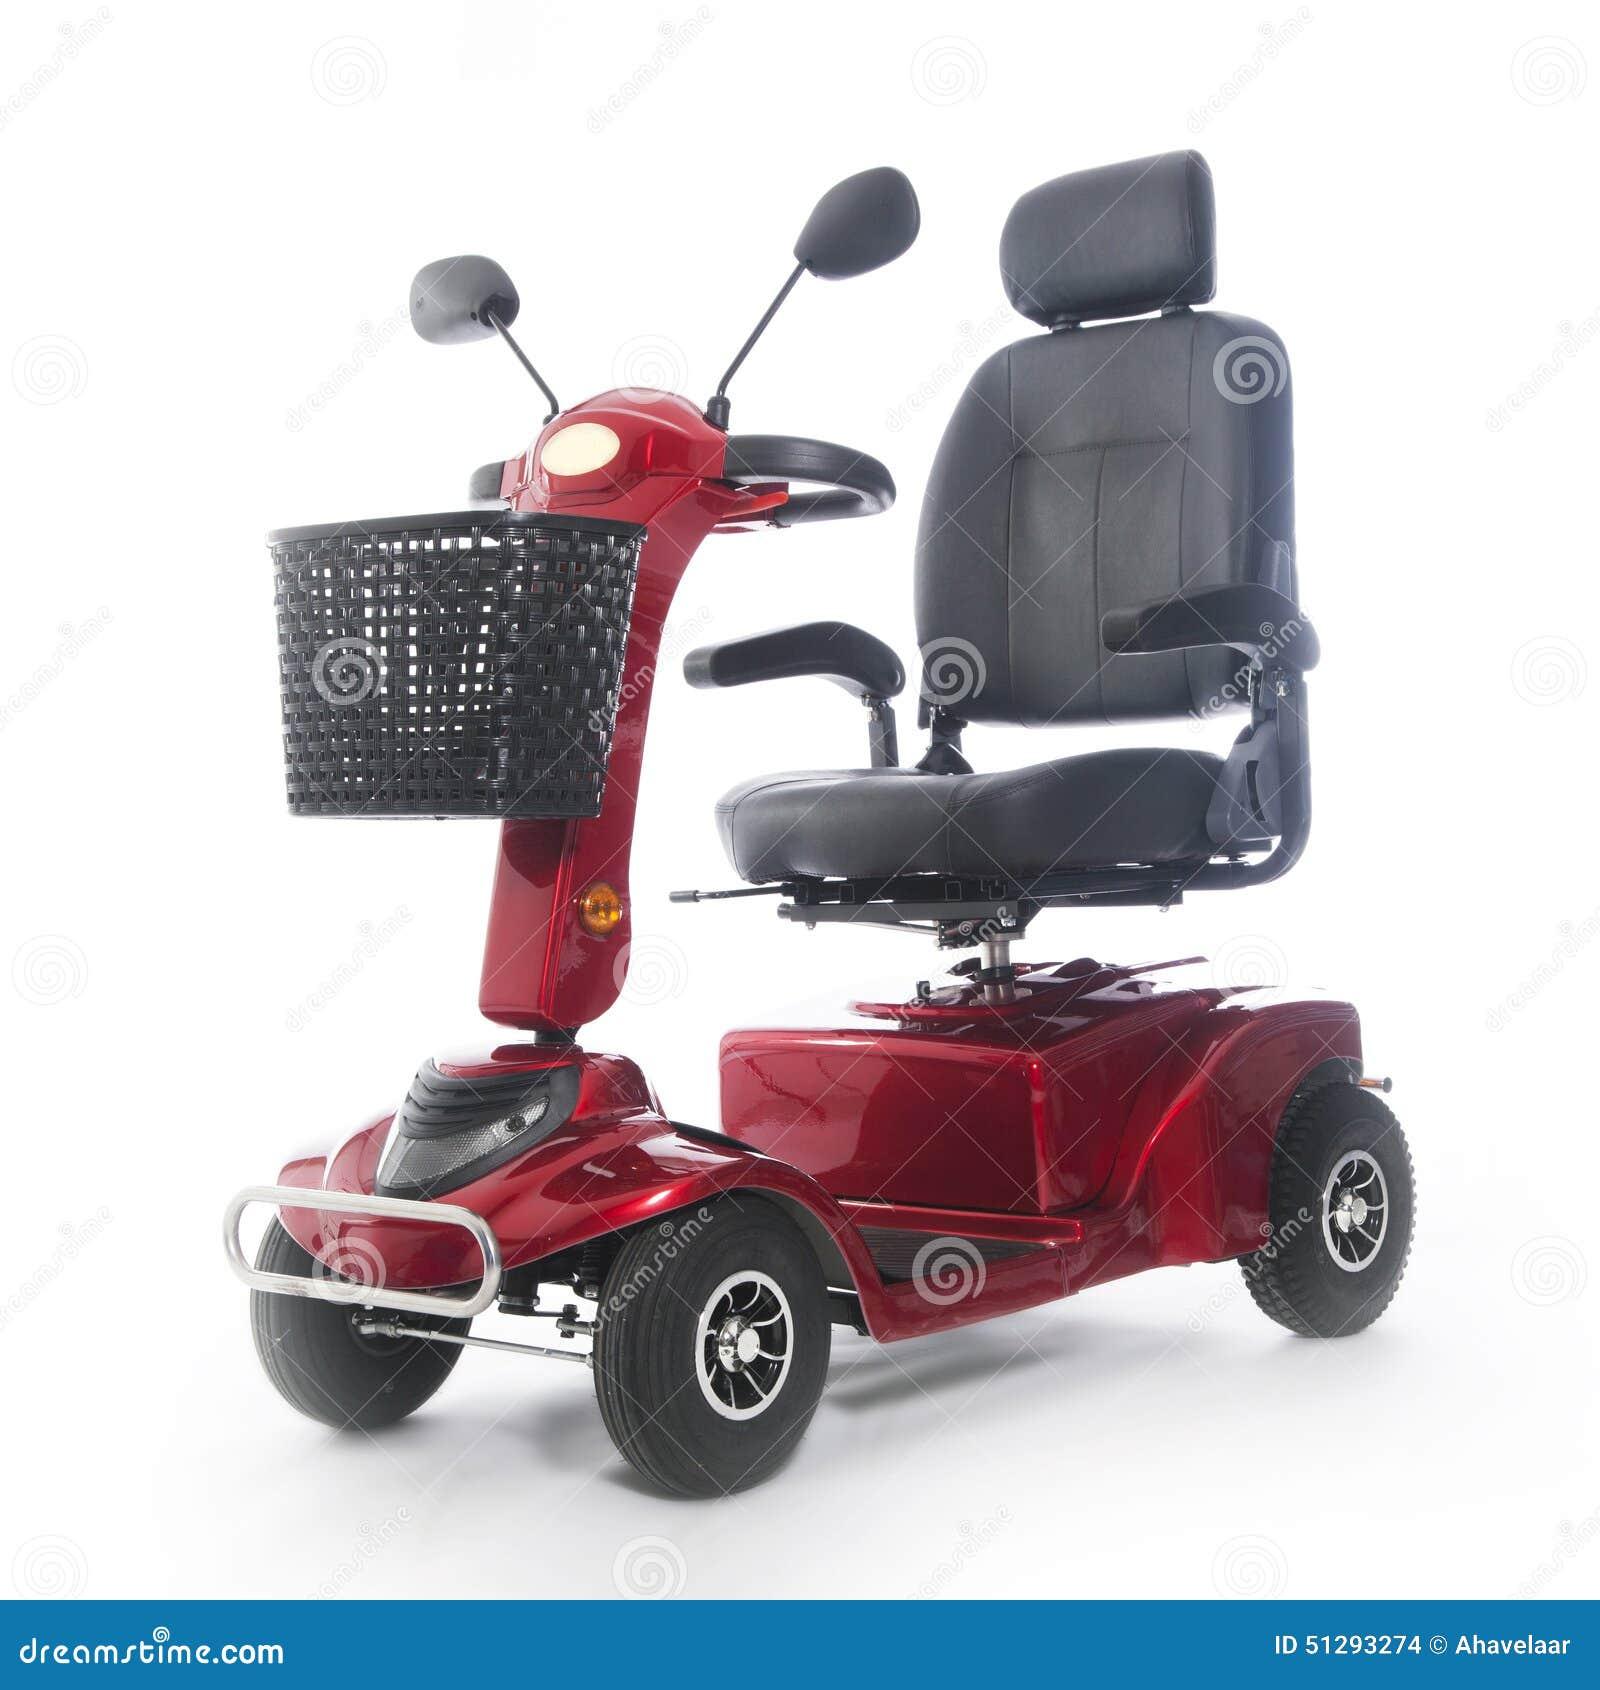 Motorized Mobility Scooter Fot Elderly People Stock Photo